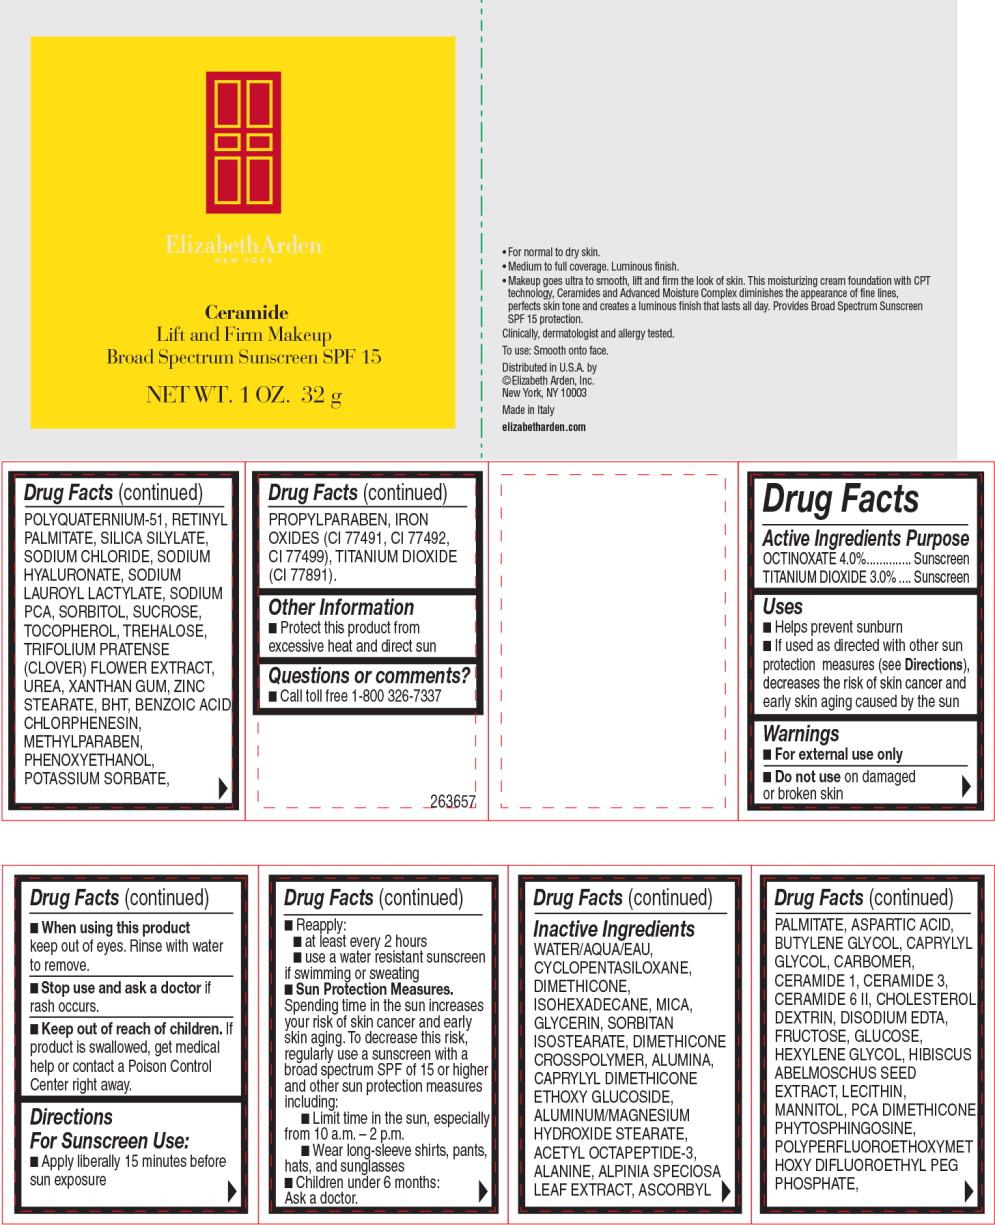 Ceramide Lift And Firm Makeup Broad Spectrum Sunscreen Spf 15 Java (Octinoxate, Titanium Dioxide) Cream [Elizabeth Arden, Inc]